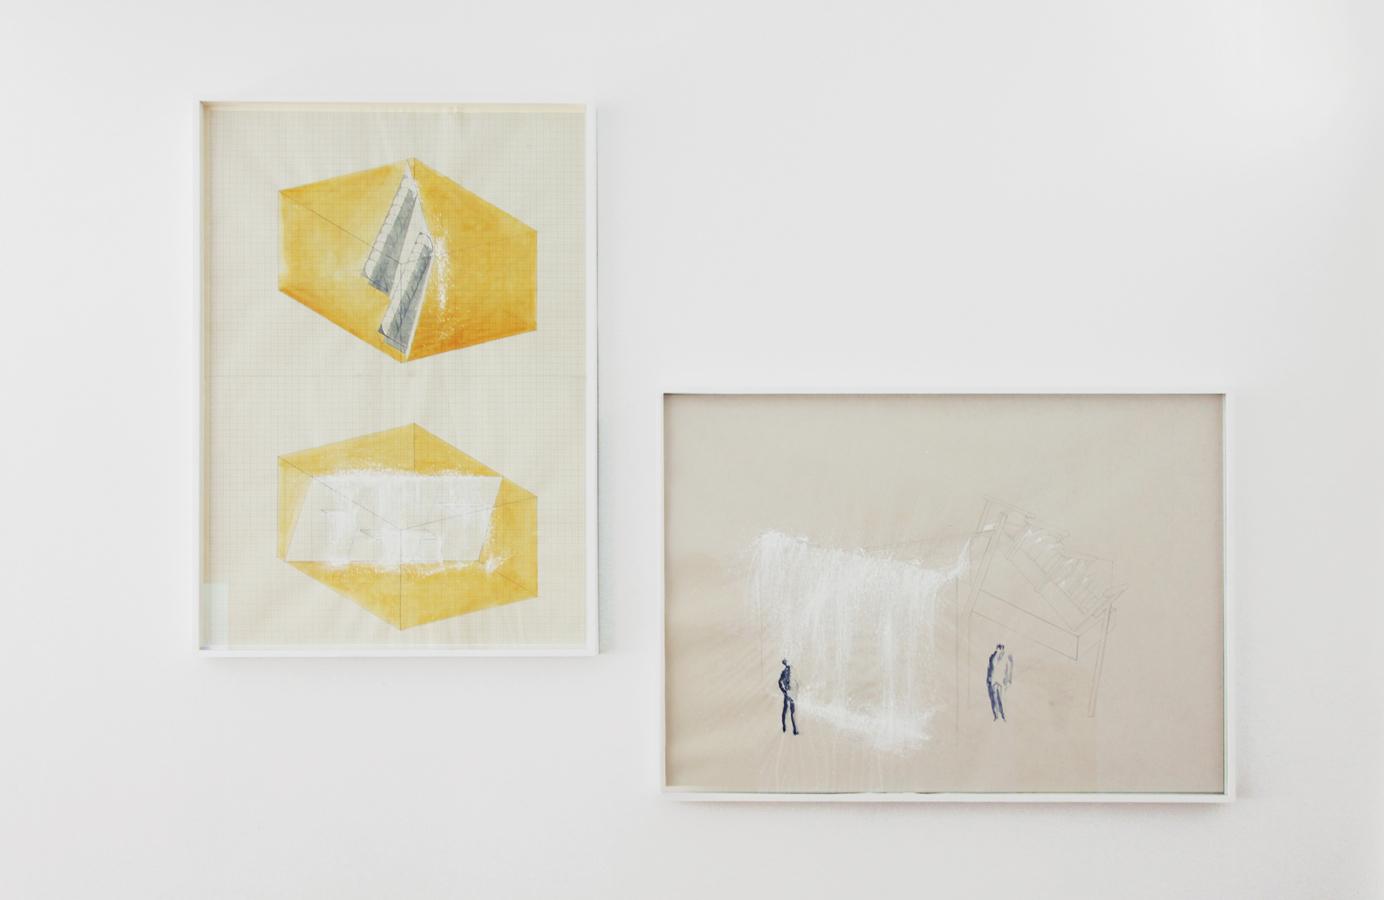 'Testing Time' Sketches, 2014 | Troika (Eva Rucki, Sebastien Noel, Conny Freyer)